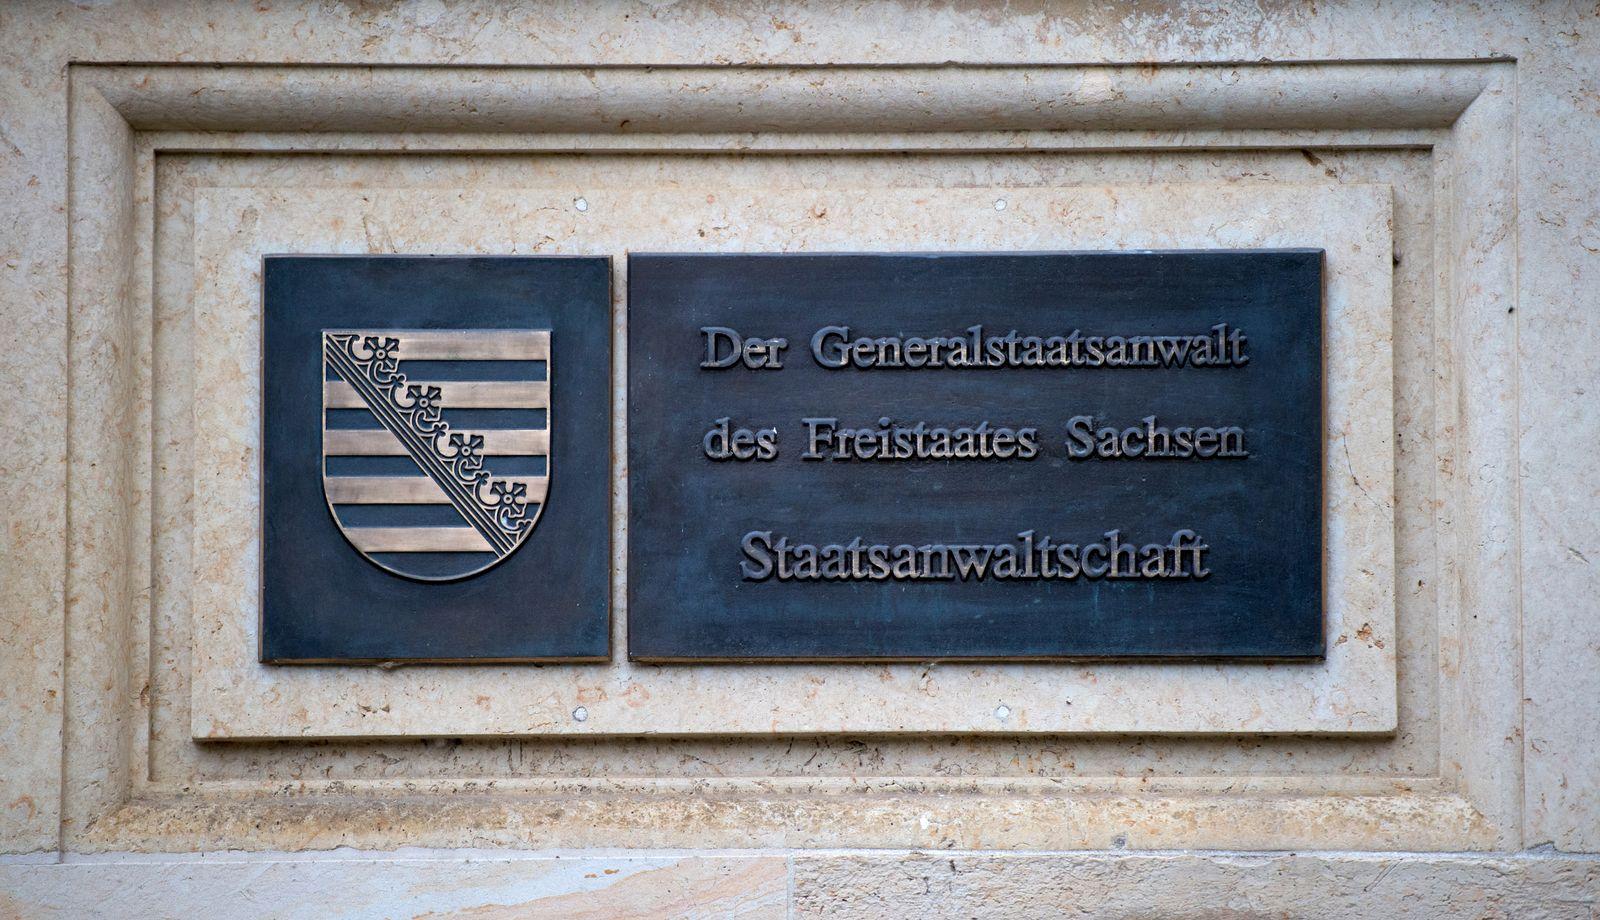 Generalstaatsanwalt in Chemnitz